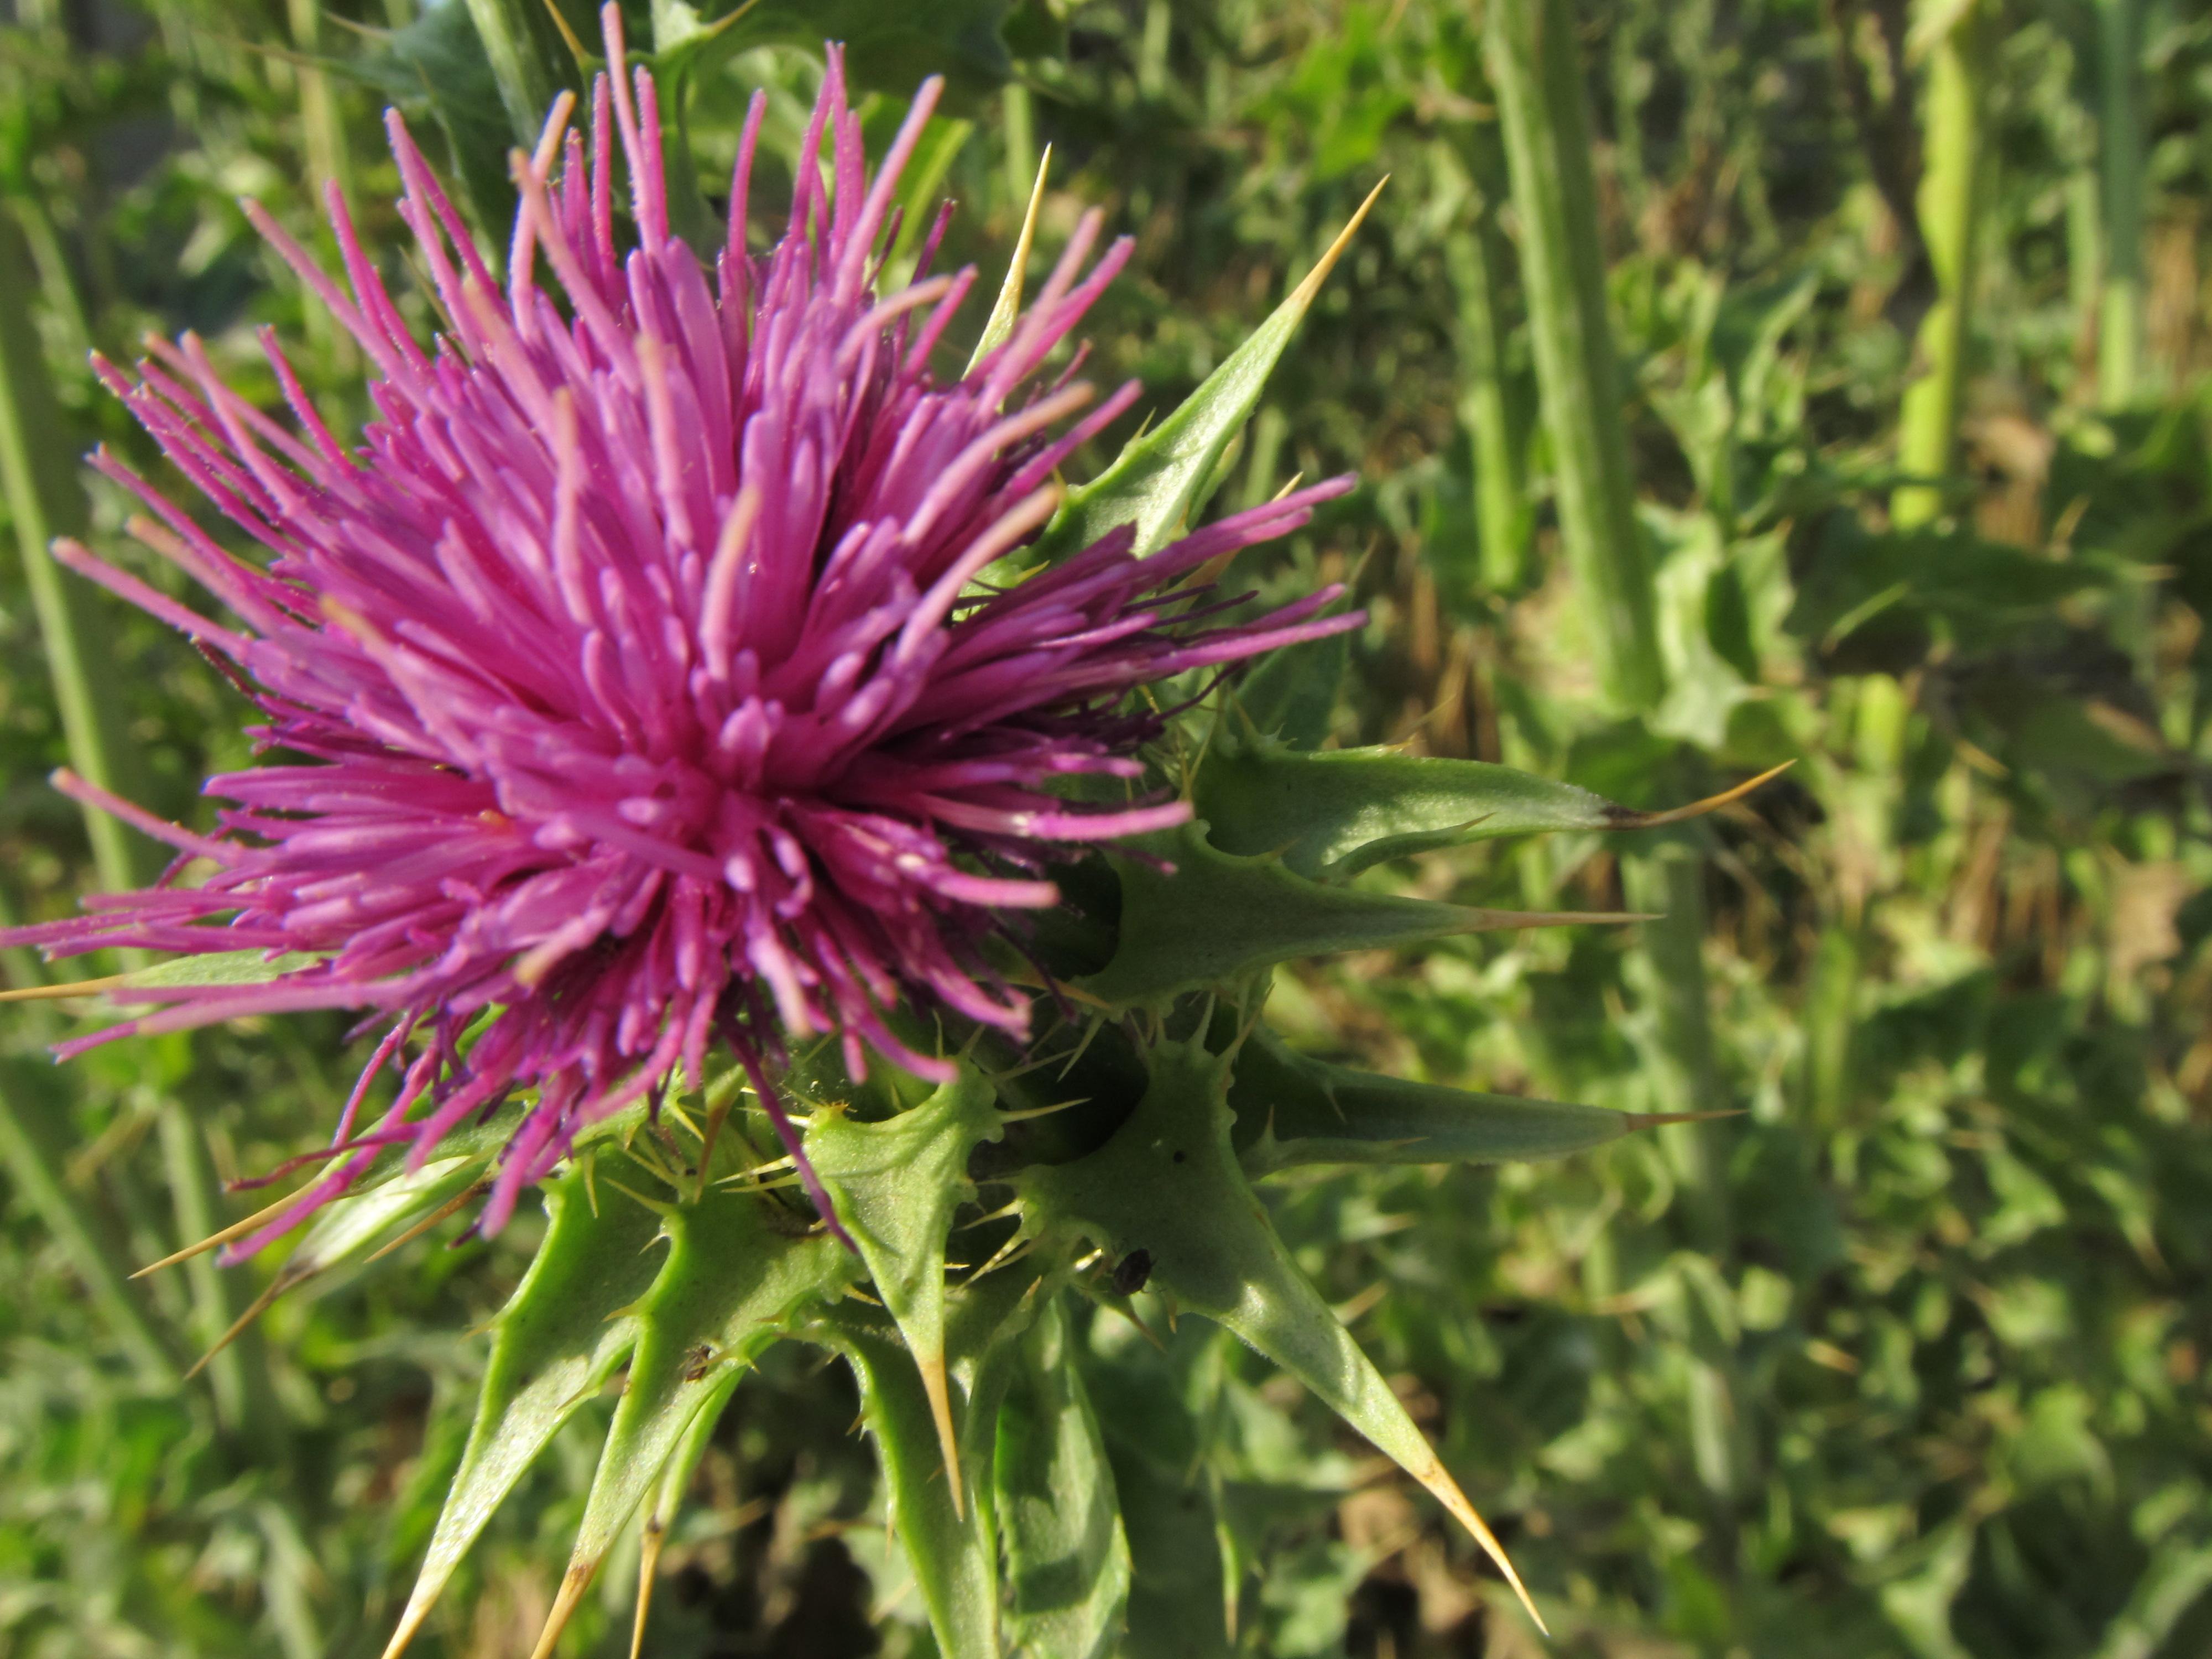 4 piante efficaci per depurare l'organismo